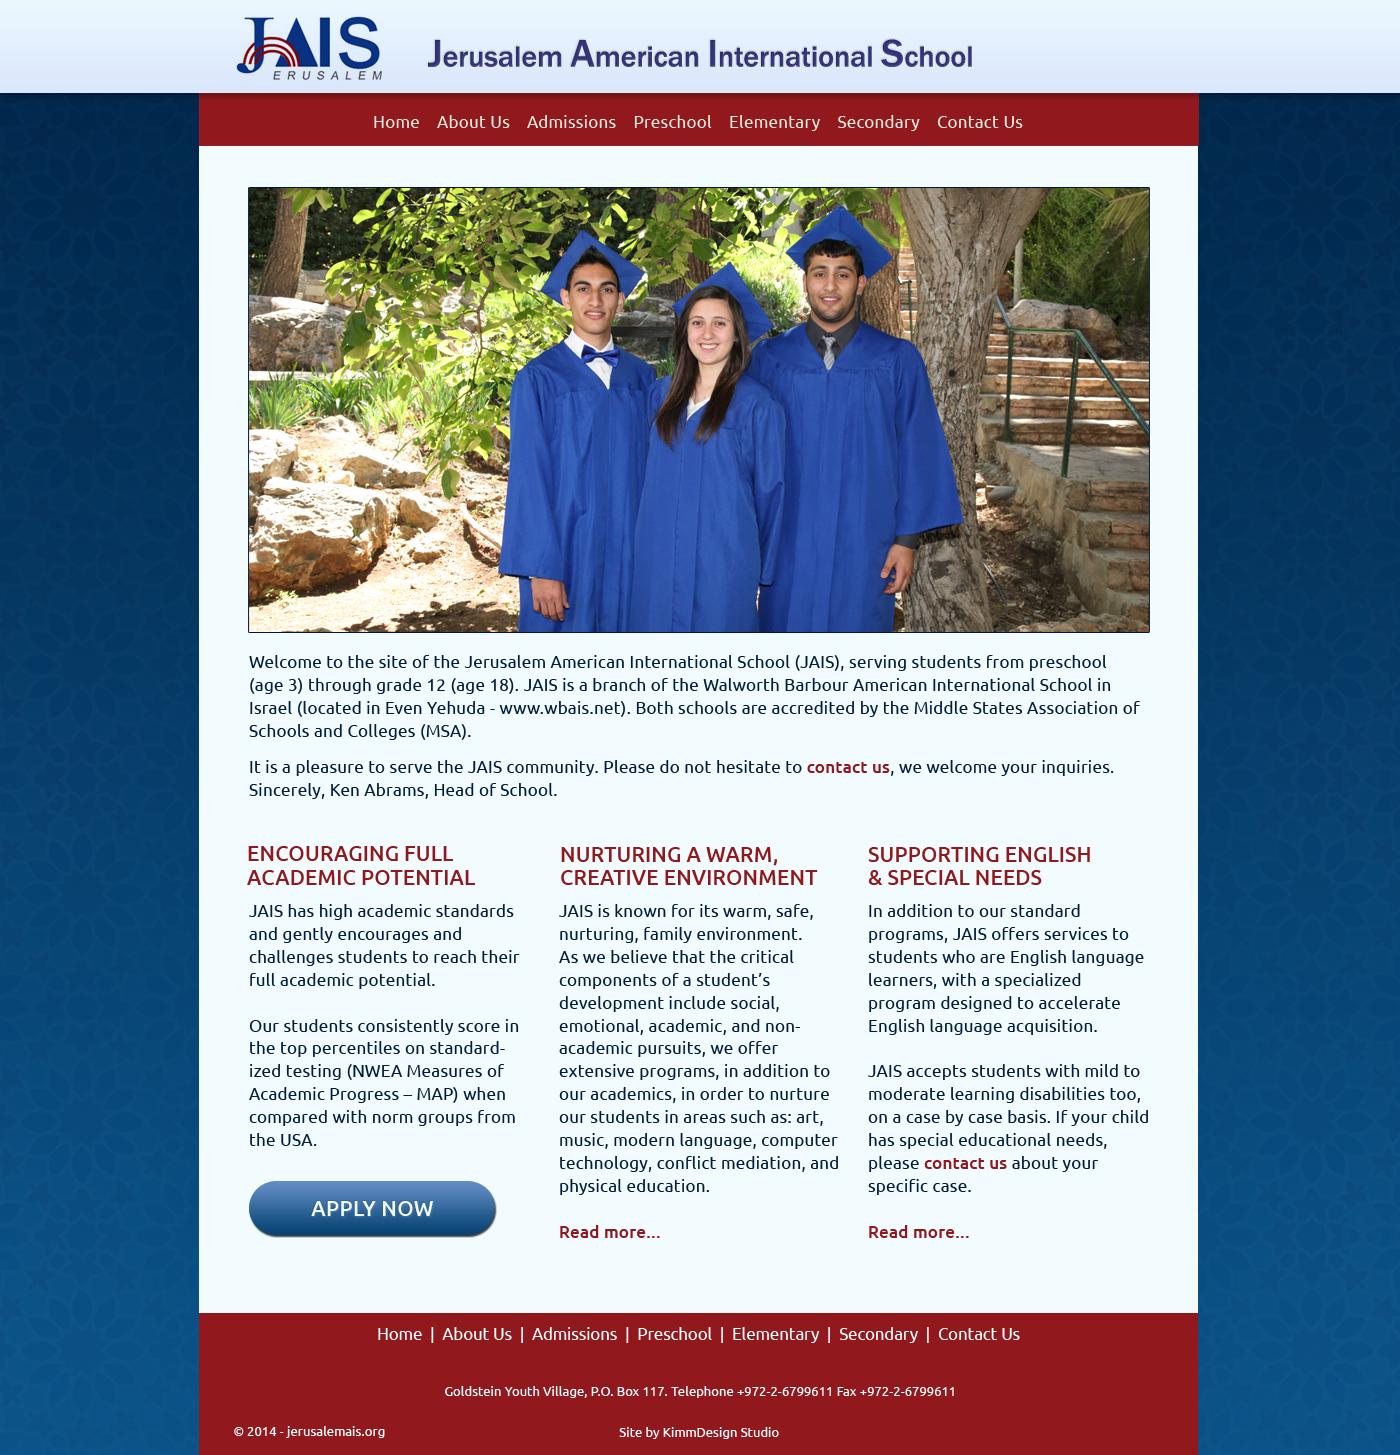 Jerusalem American International School (JAIS) home page design image